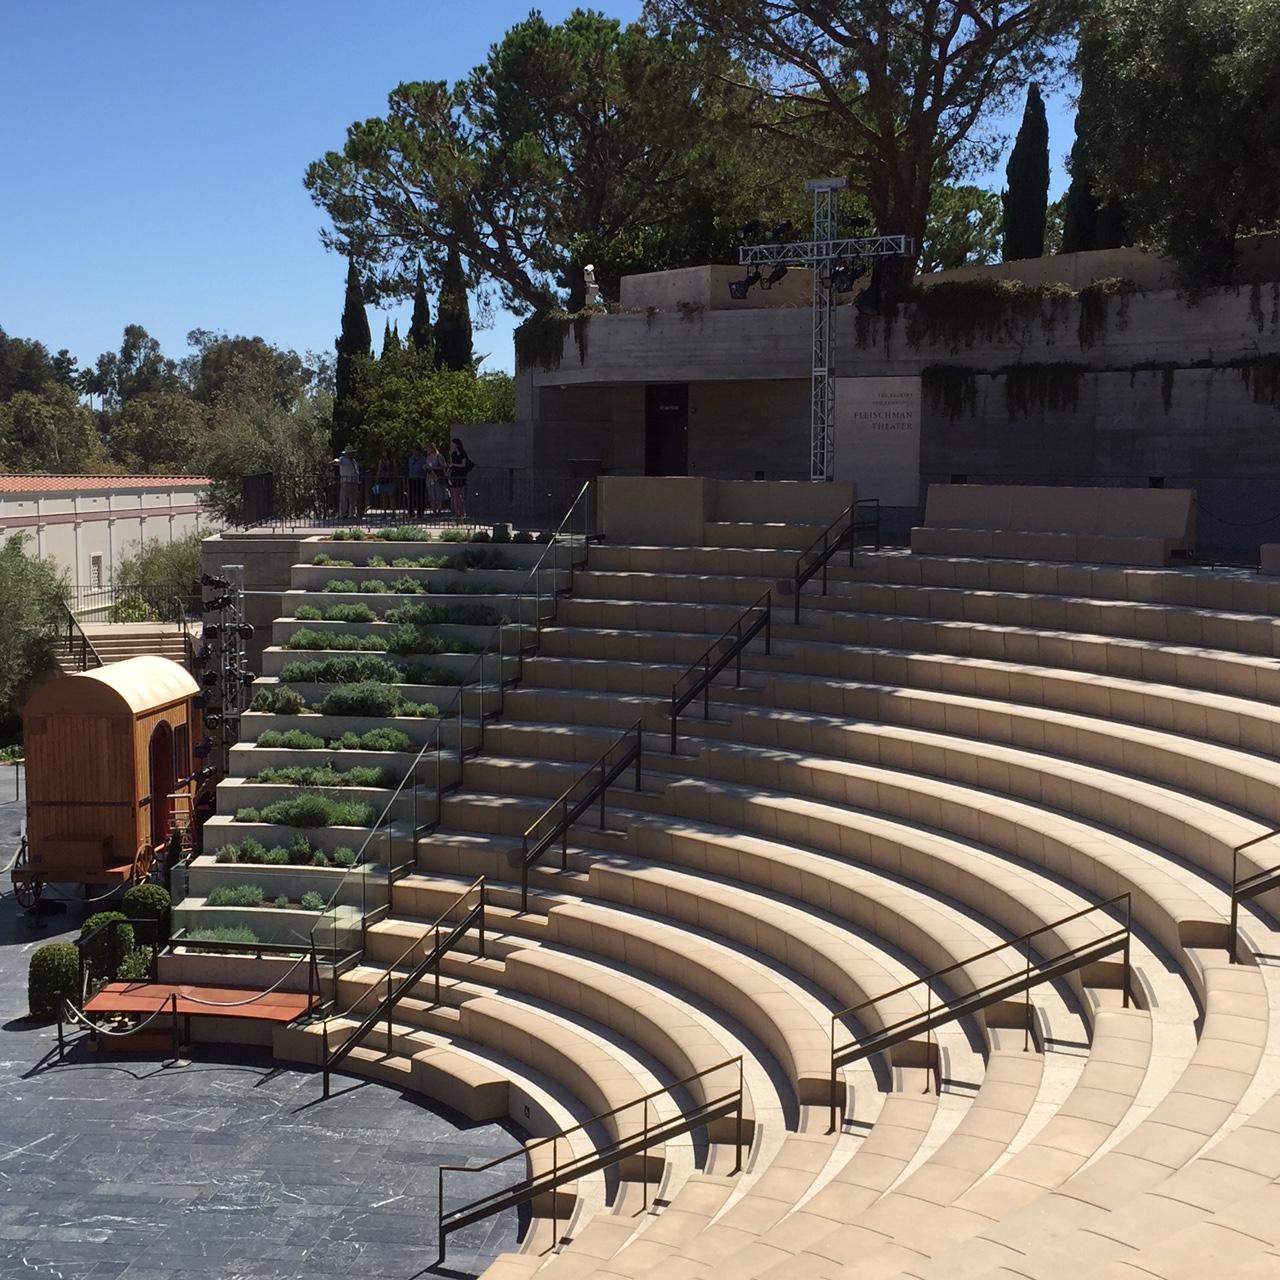 Getty Amphitheatre